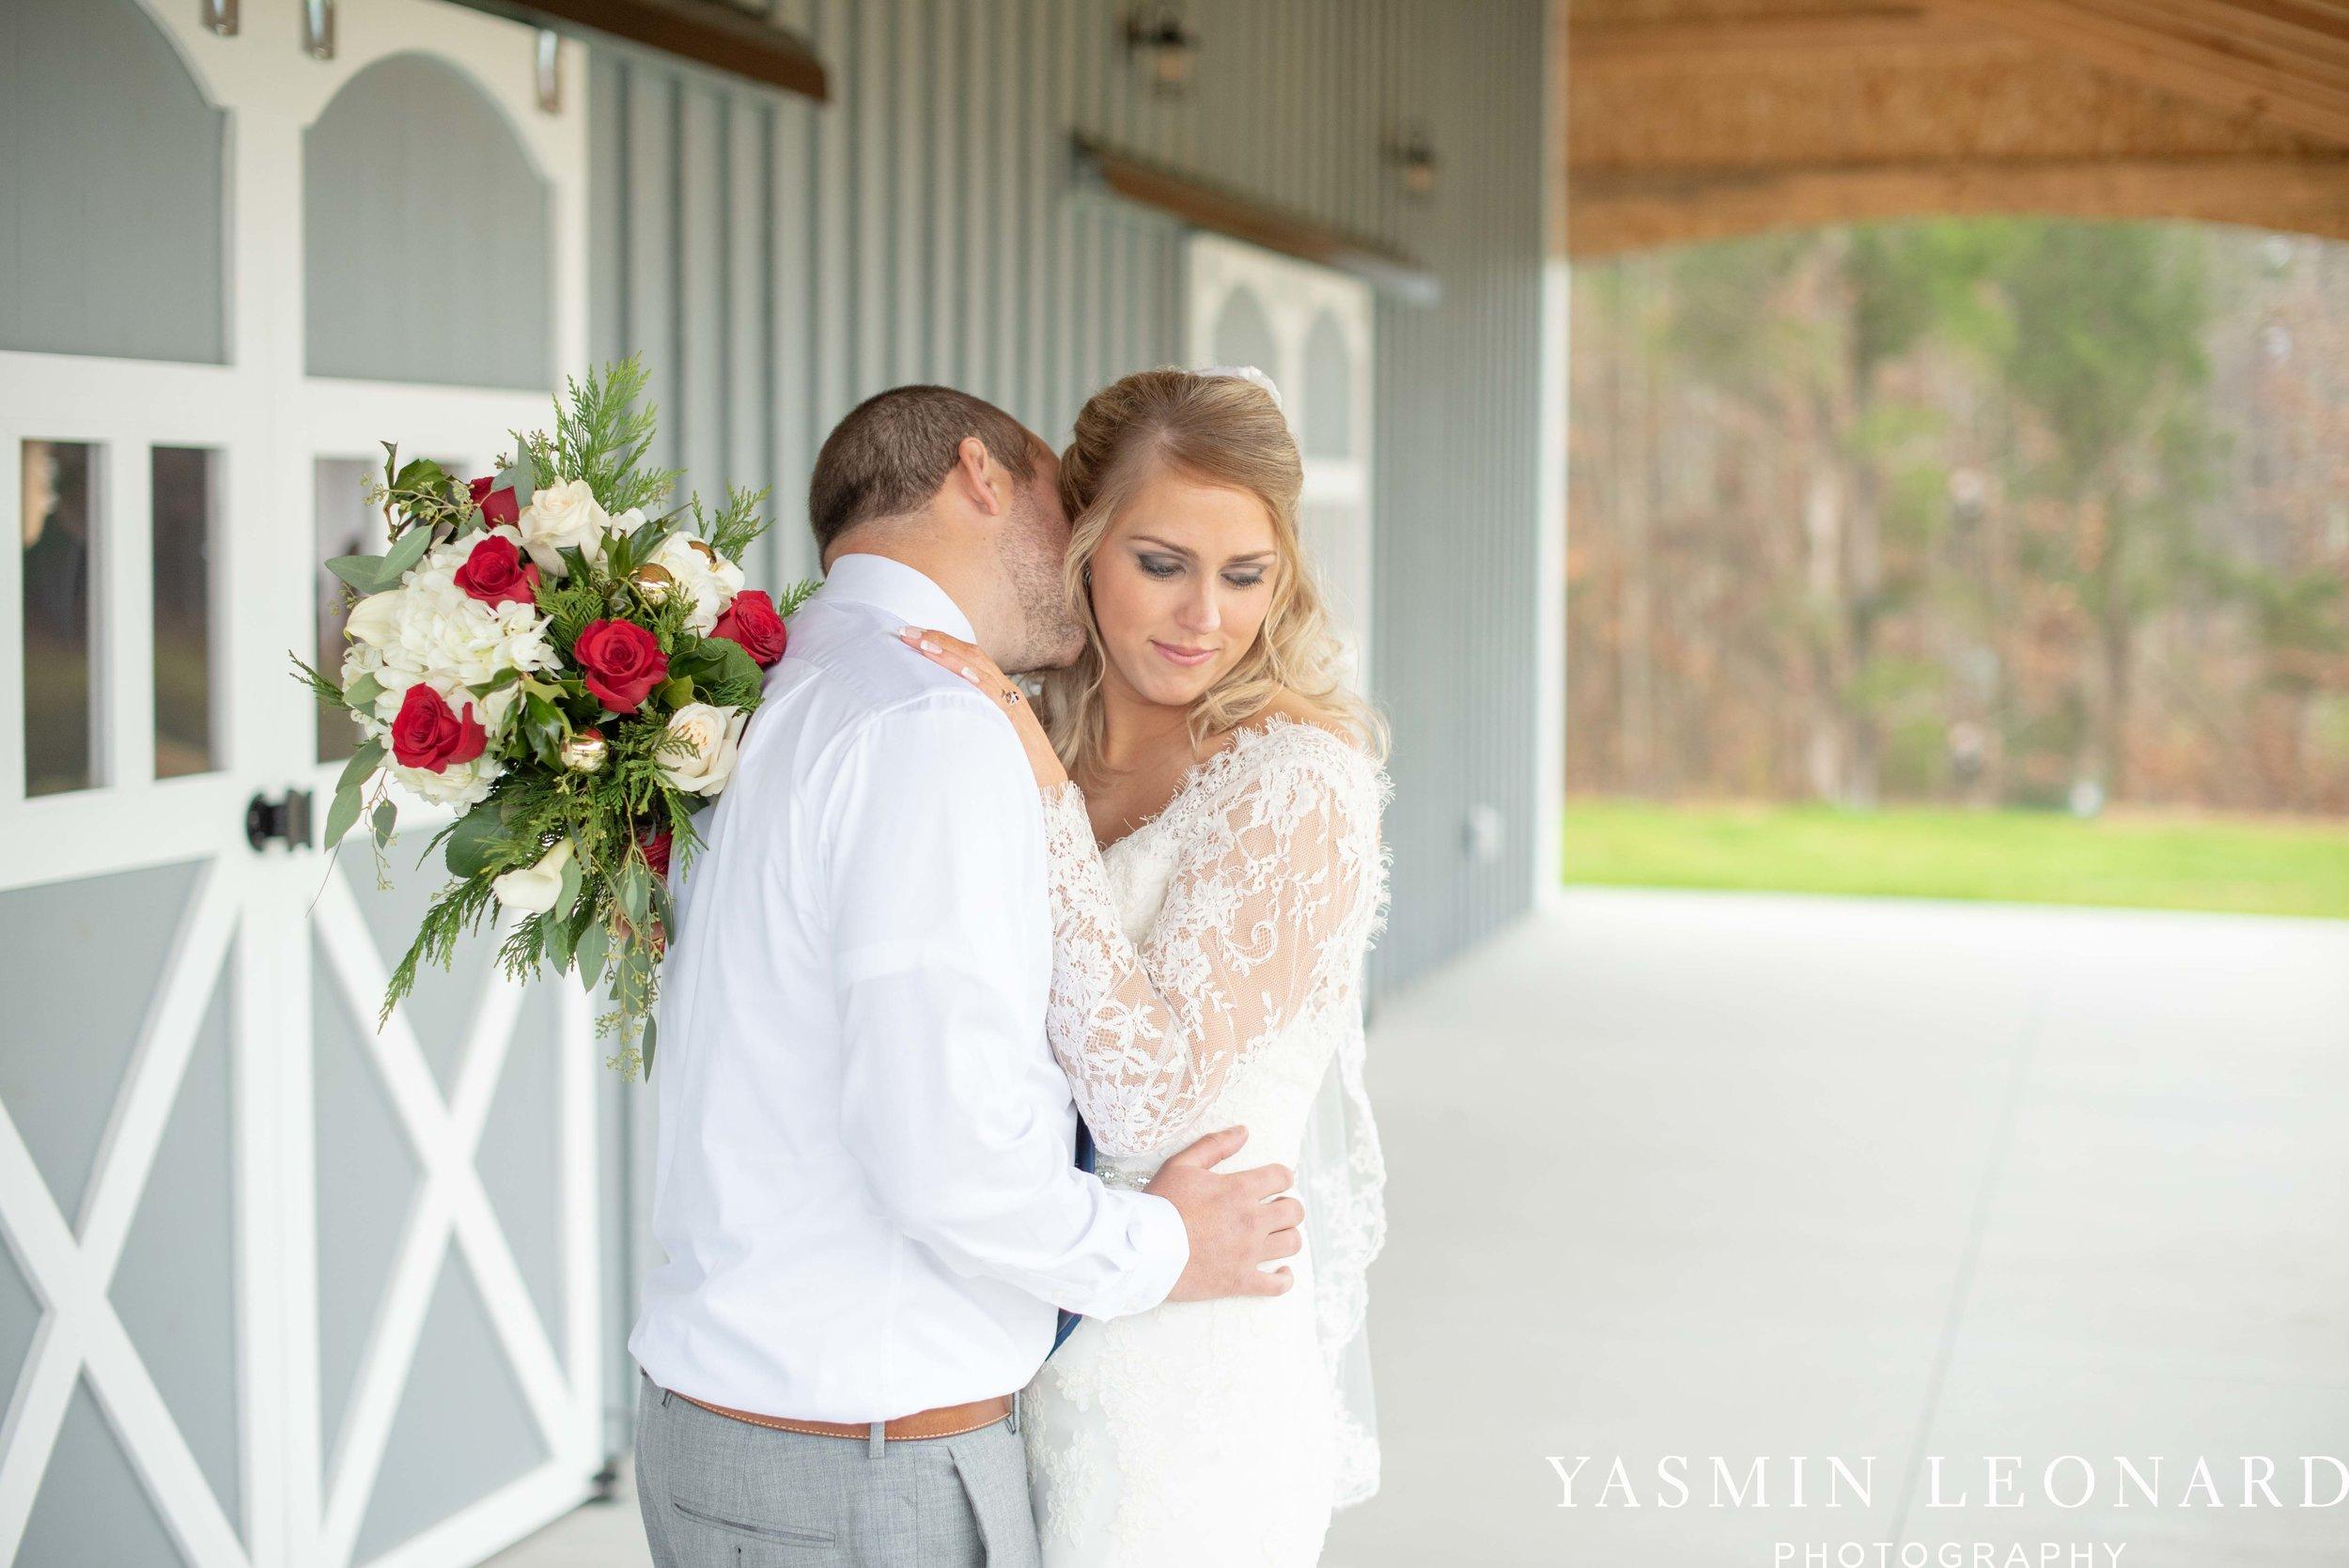 Secret Meadows at Green Dell Farm, NC Barns, NC Wedding Venues, Triad, NC, NC Wedding Photography, Triad Wedding Venues, Affordable Wedding Venues, NEW Wedding Venues, Christmas Weddings-31.jpg